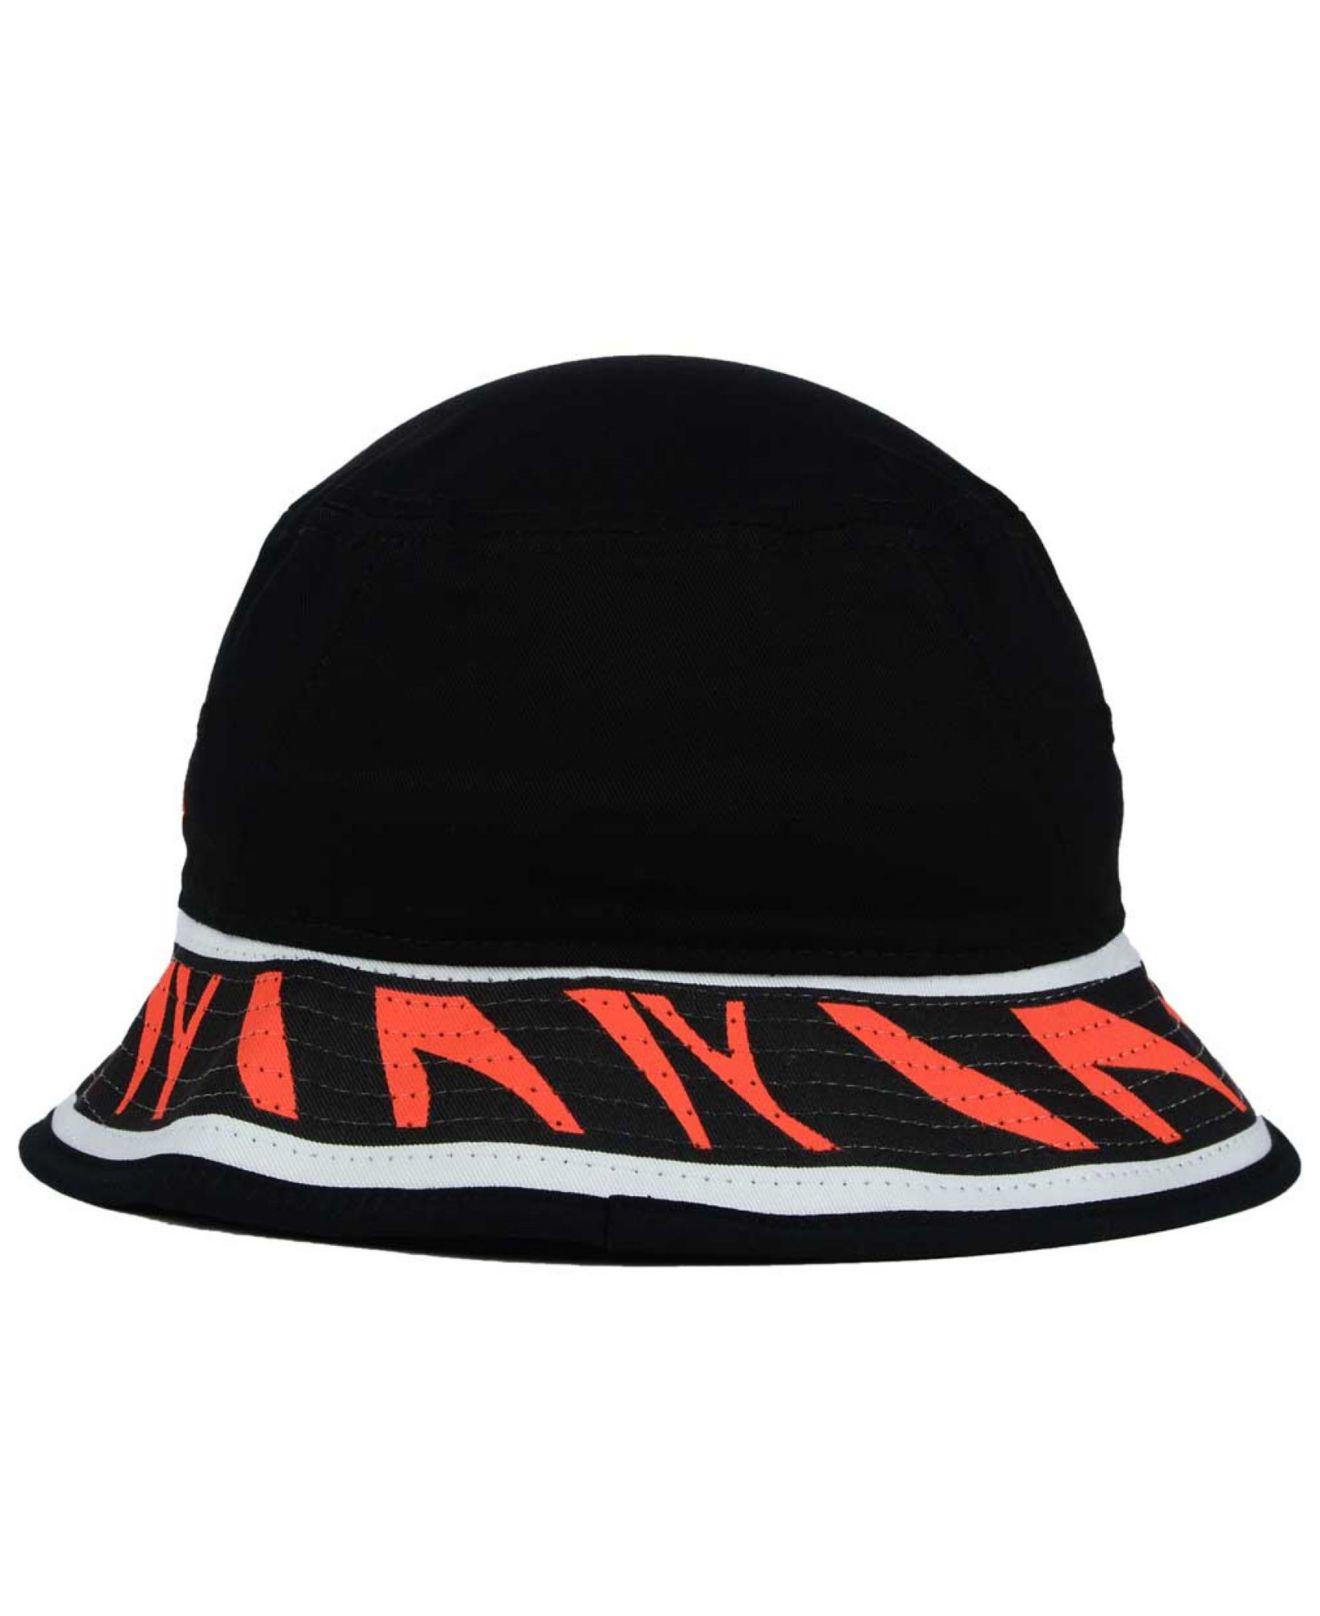 Lyst - Ktz Cincinnati Bengals Team Stripe Bucket Hat in Black for Men a4cac8260